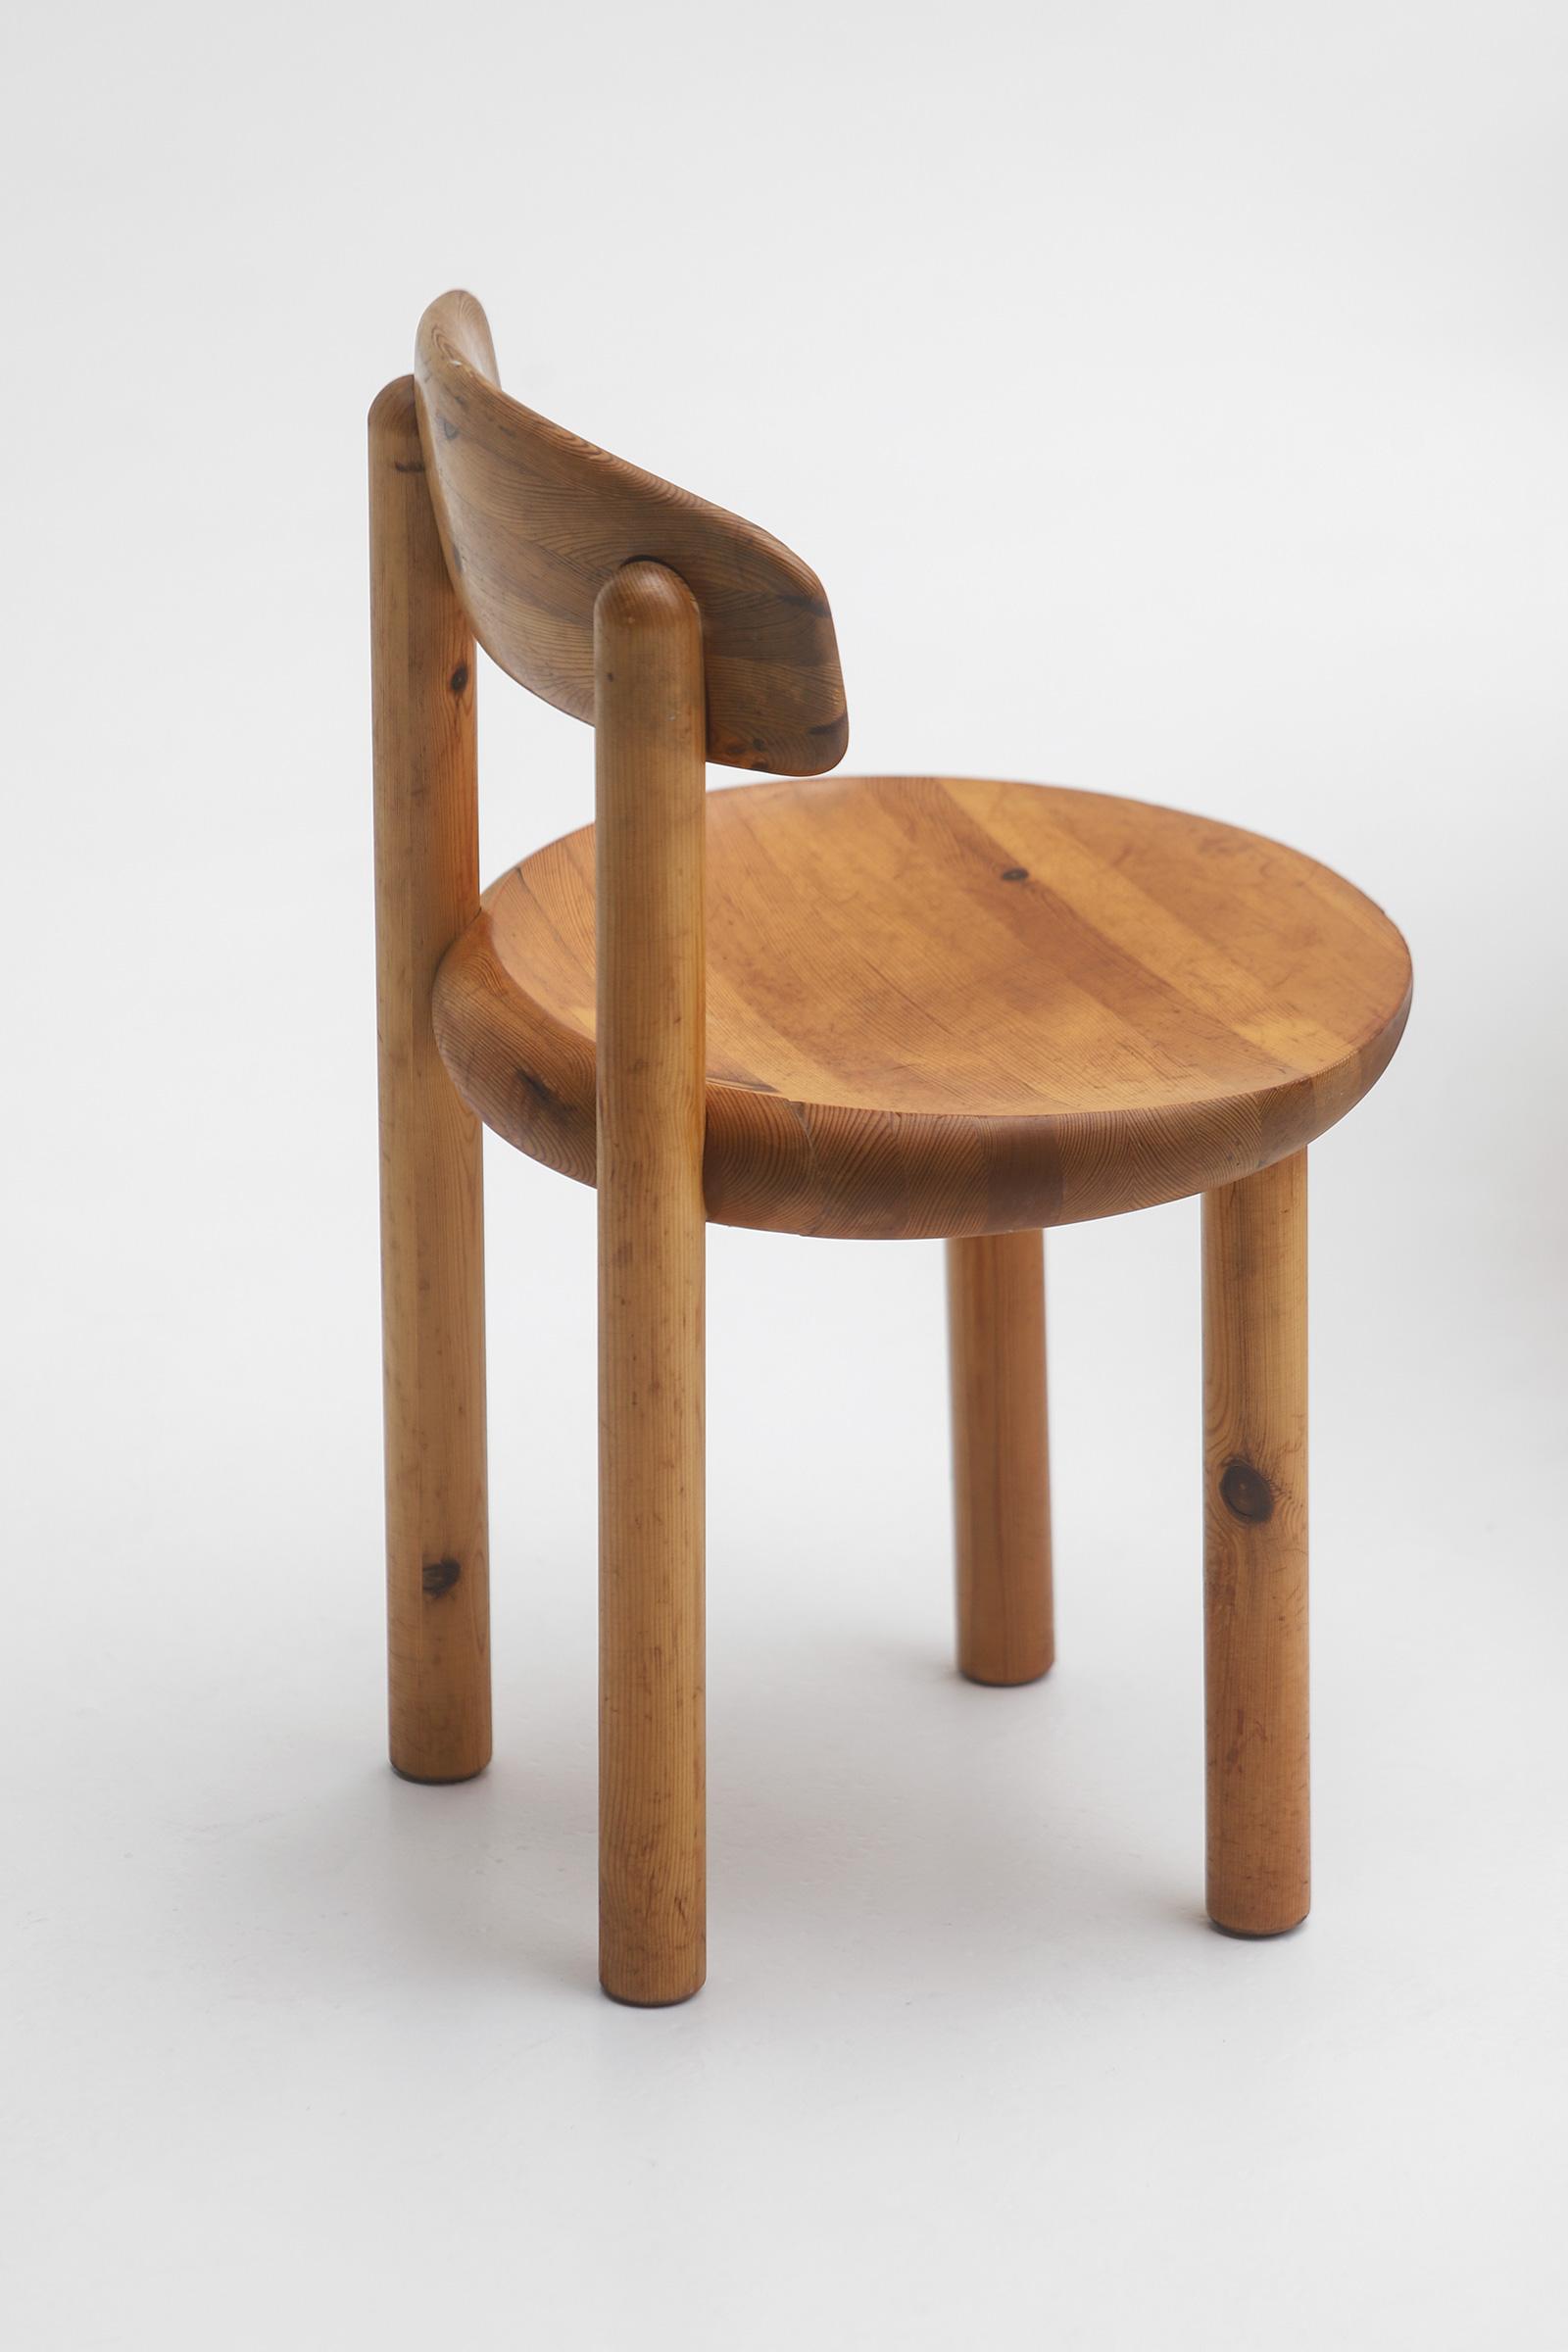 5 Daumiller Pinewood Chairsimage 5